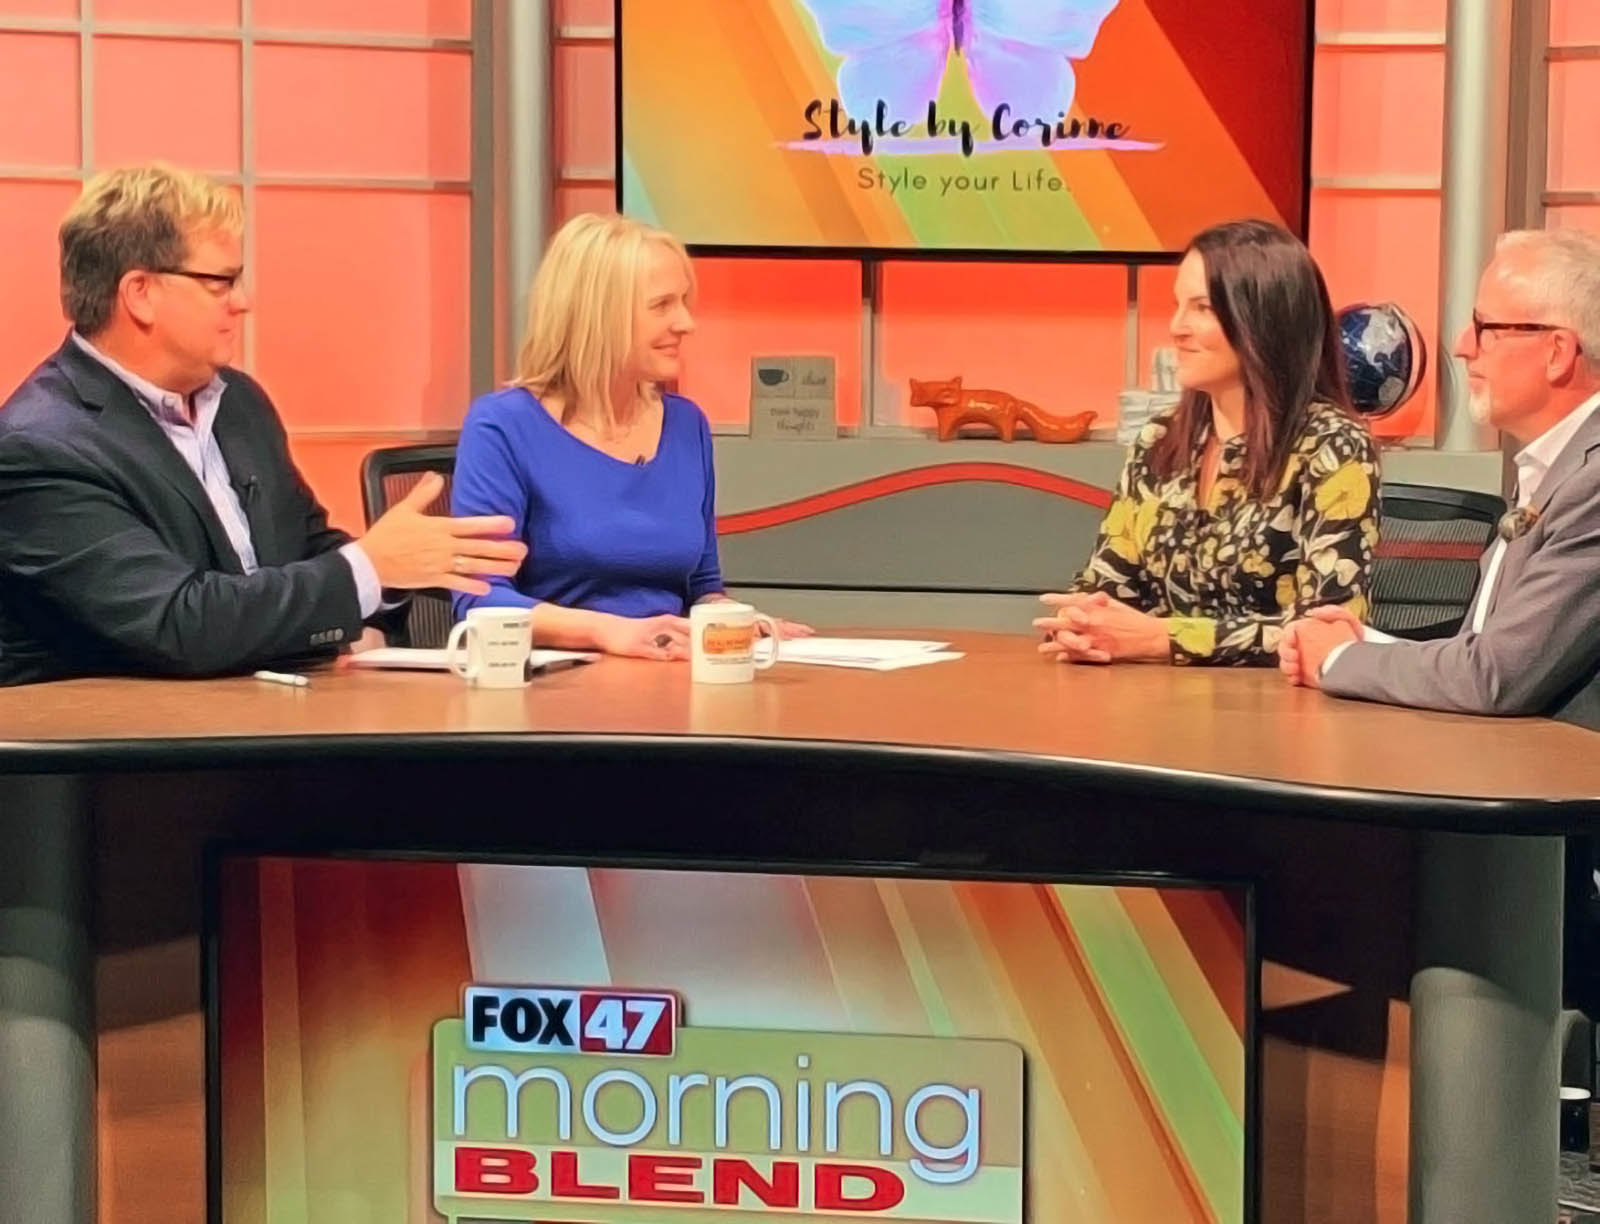 Fox 47 News Morning Blend